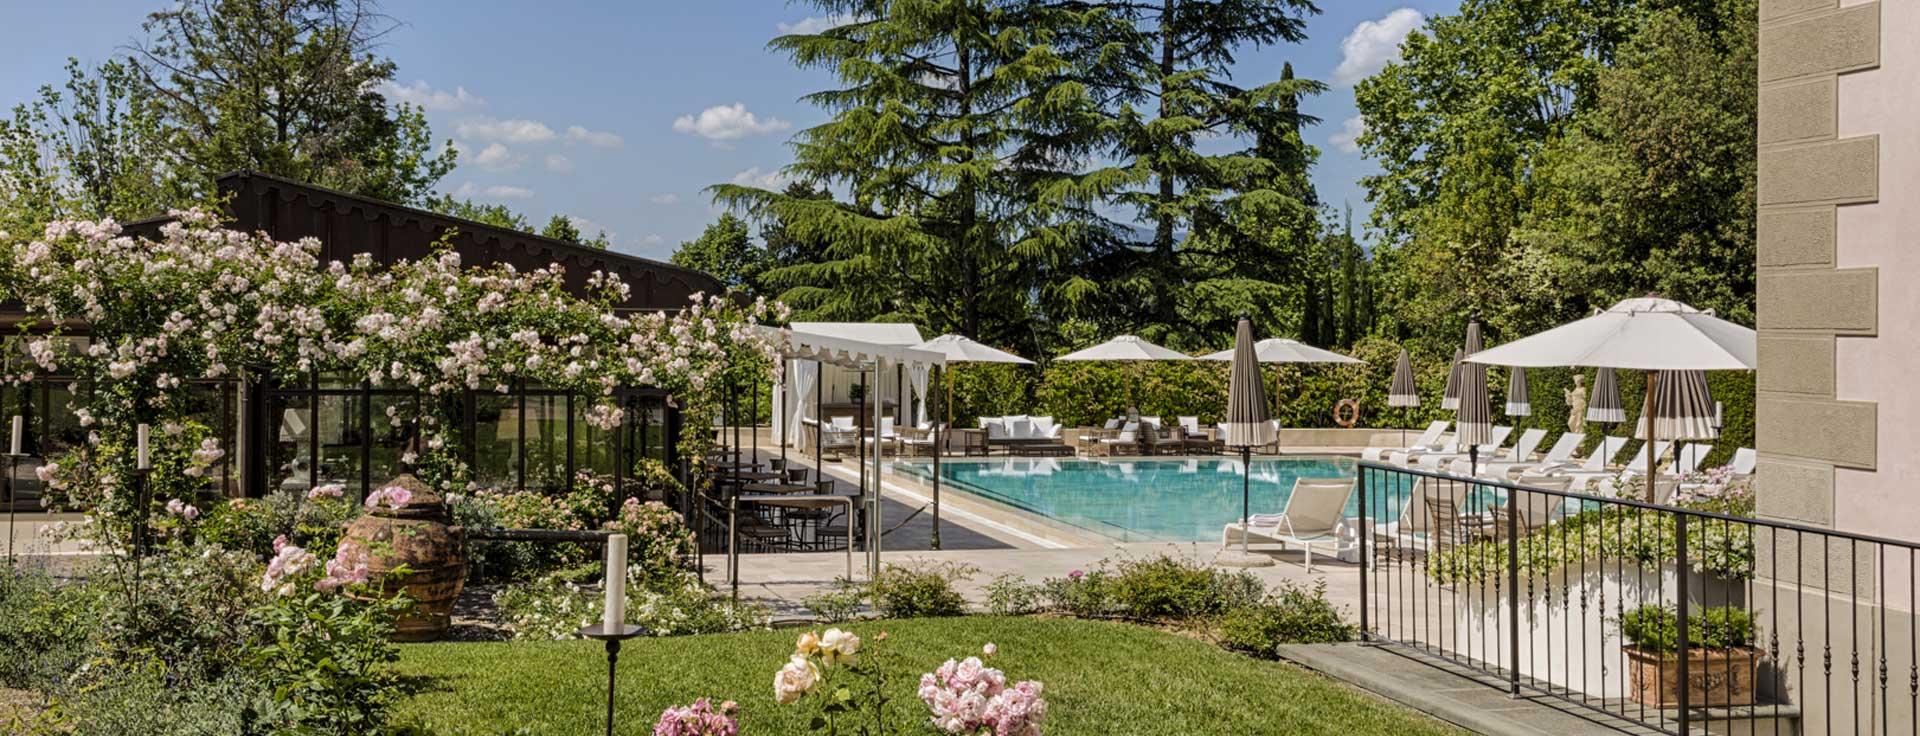 Hotel Villa Carlotta Firenze Booking